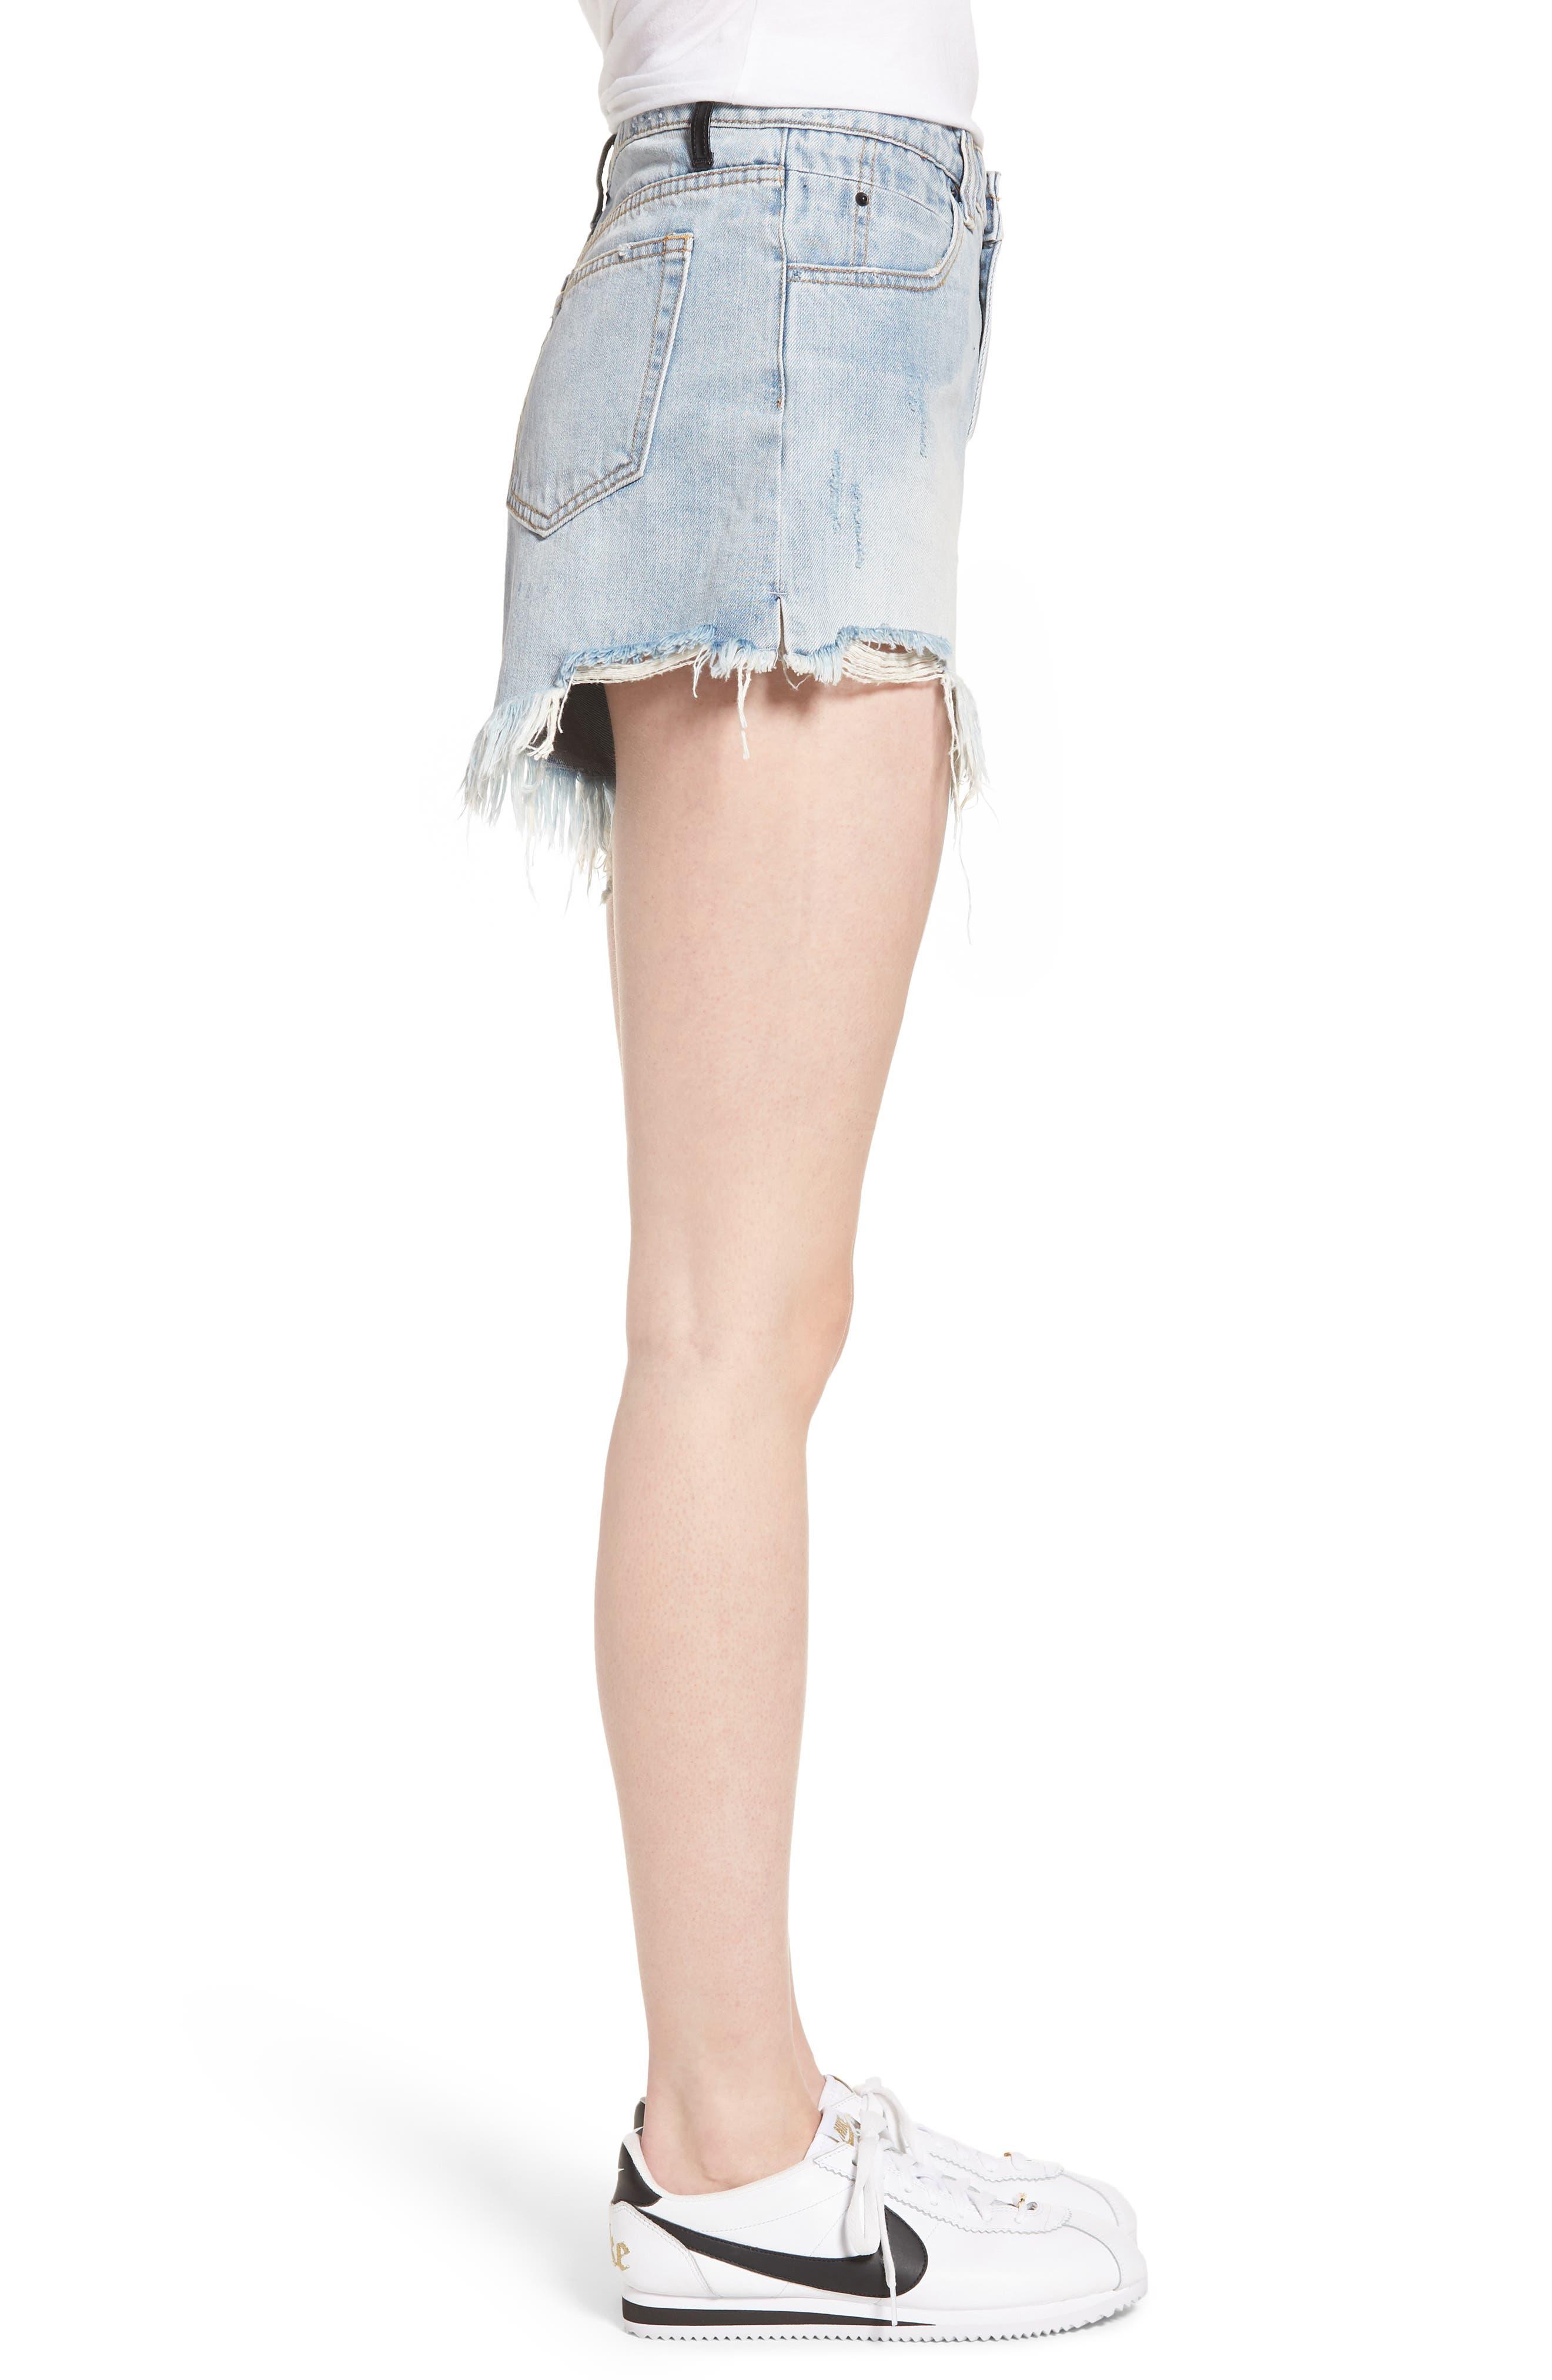 Arien High Waist Cutoff Denim Shorts,                             Alternate thumbnail 3, color,                             Washed Blue